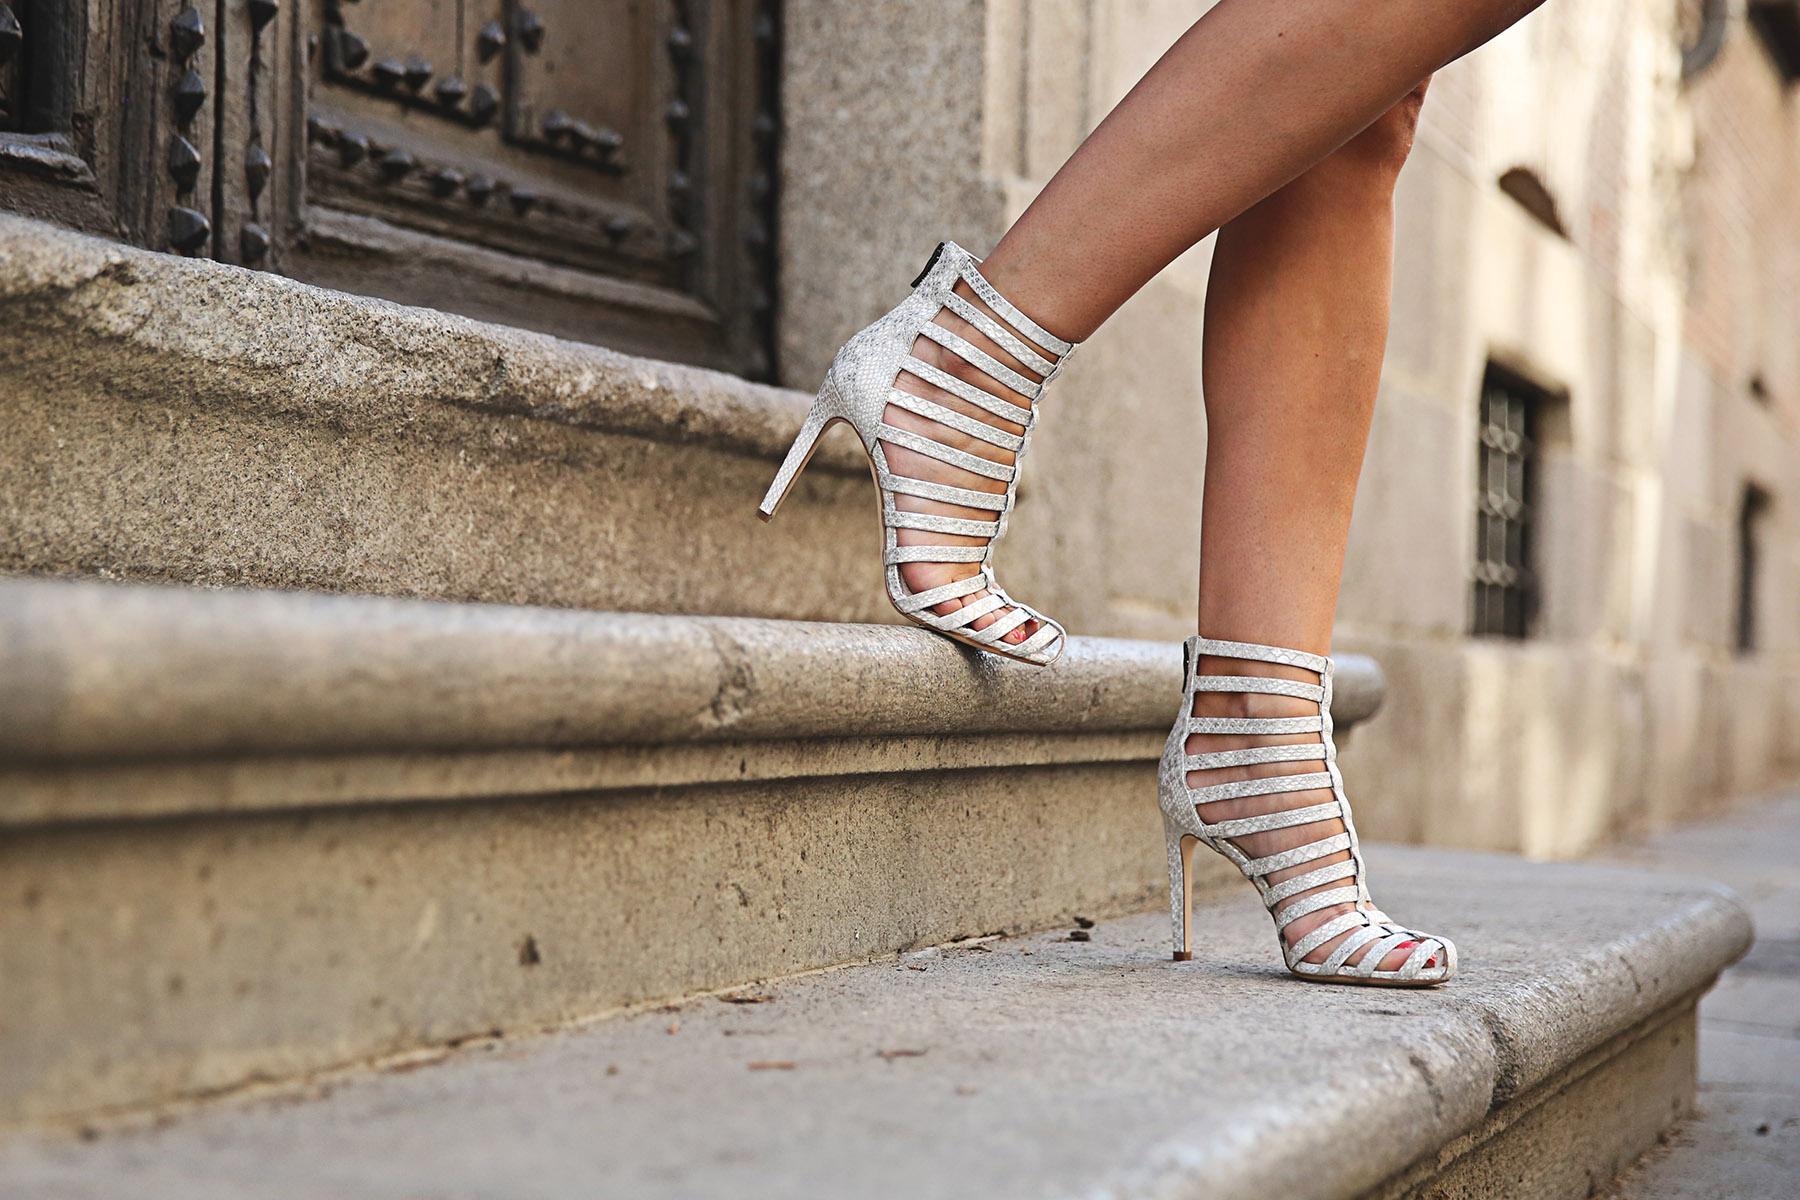 trendy-taste-look-outfit-street-style-ootd-blog-blogger-fashion-spain-moda-españa-lolali-blue-neopreno-azul-falda-blusa-bcbg-338-sandalias-serpiente-2